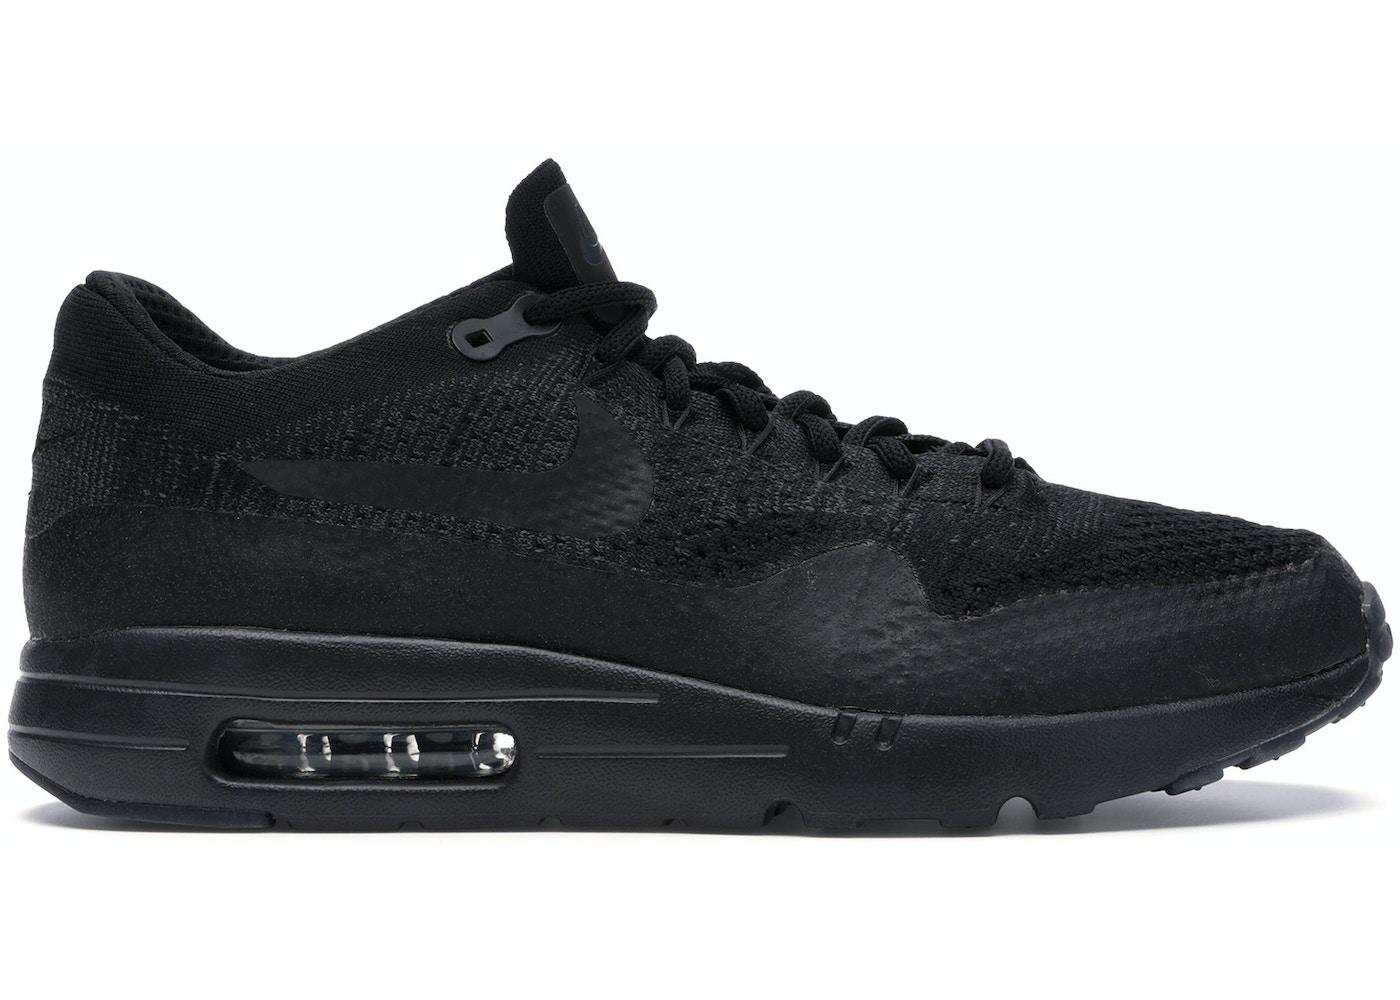 abrazo Odio escucho música  Nike Air Max 1 Ultra Flyknit Black/Black - 856958-001